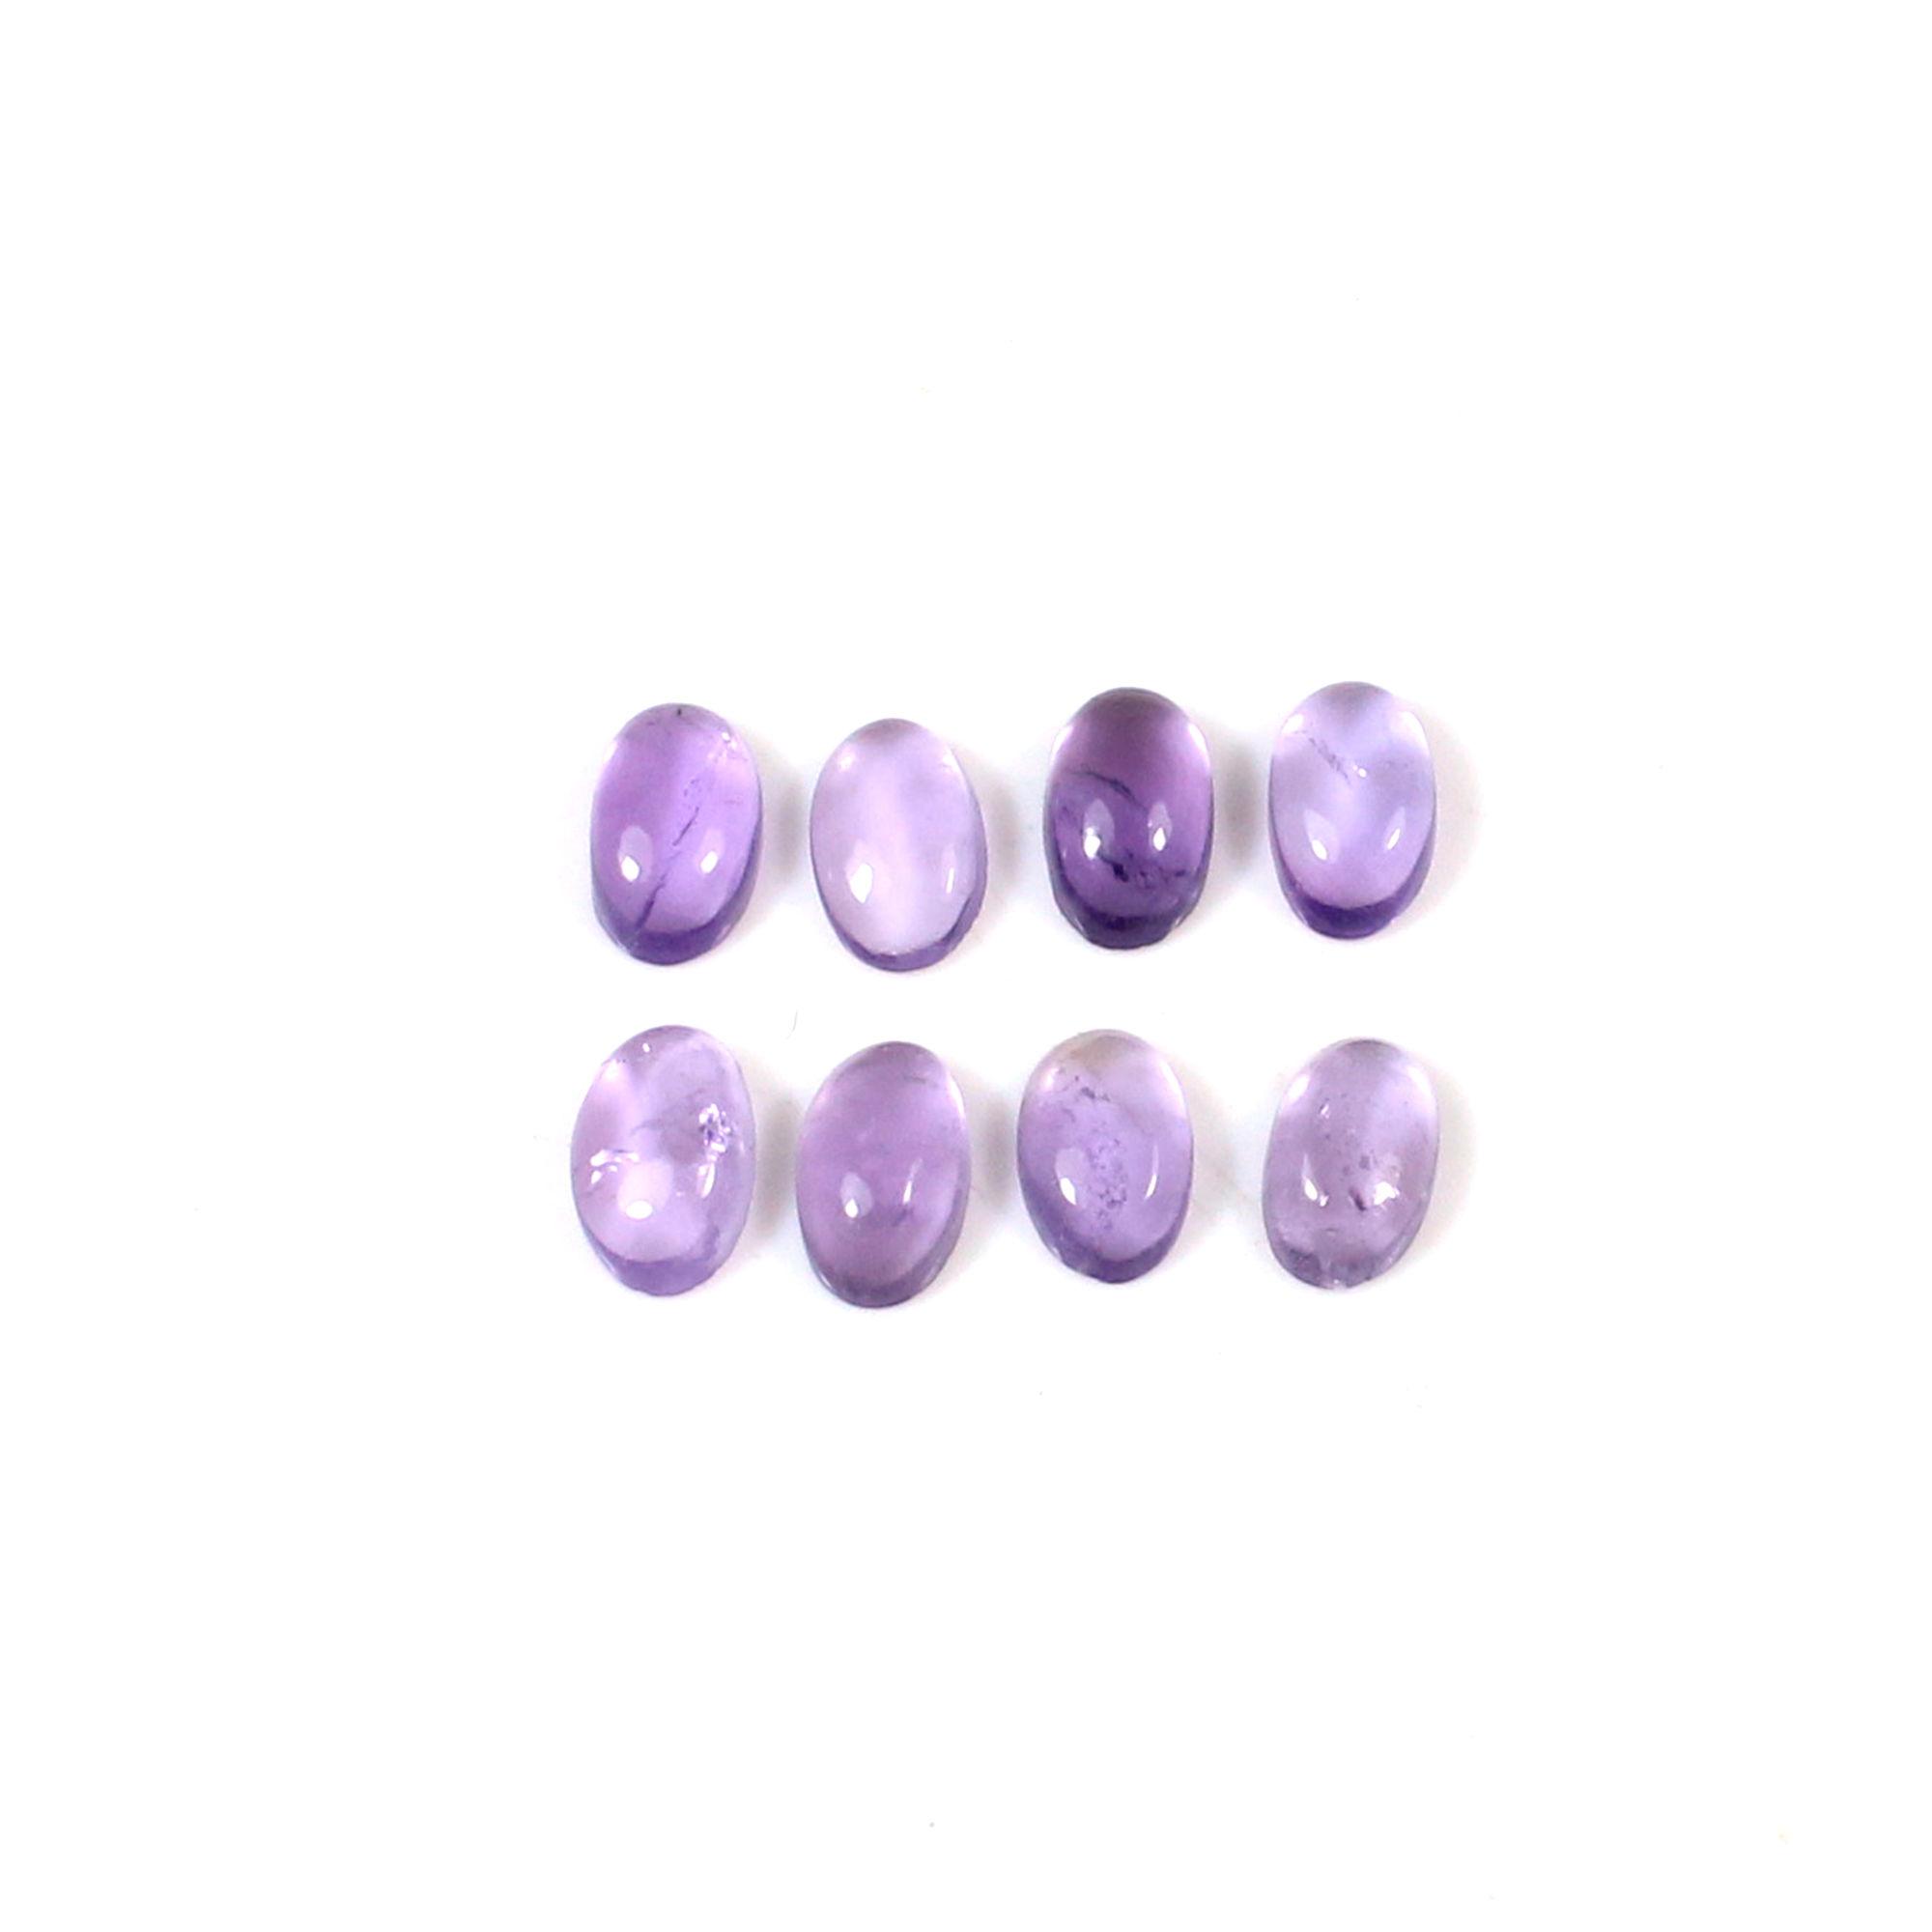 9 Pcs Natural Purple Amethyst 5x3mm Oval Cabochon 1.95 Cts